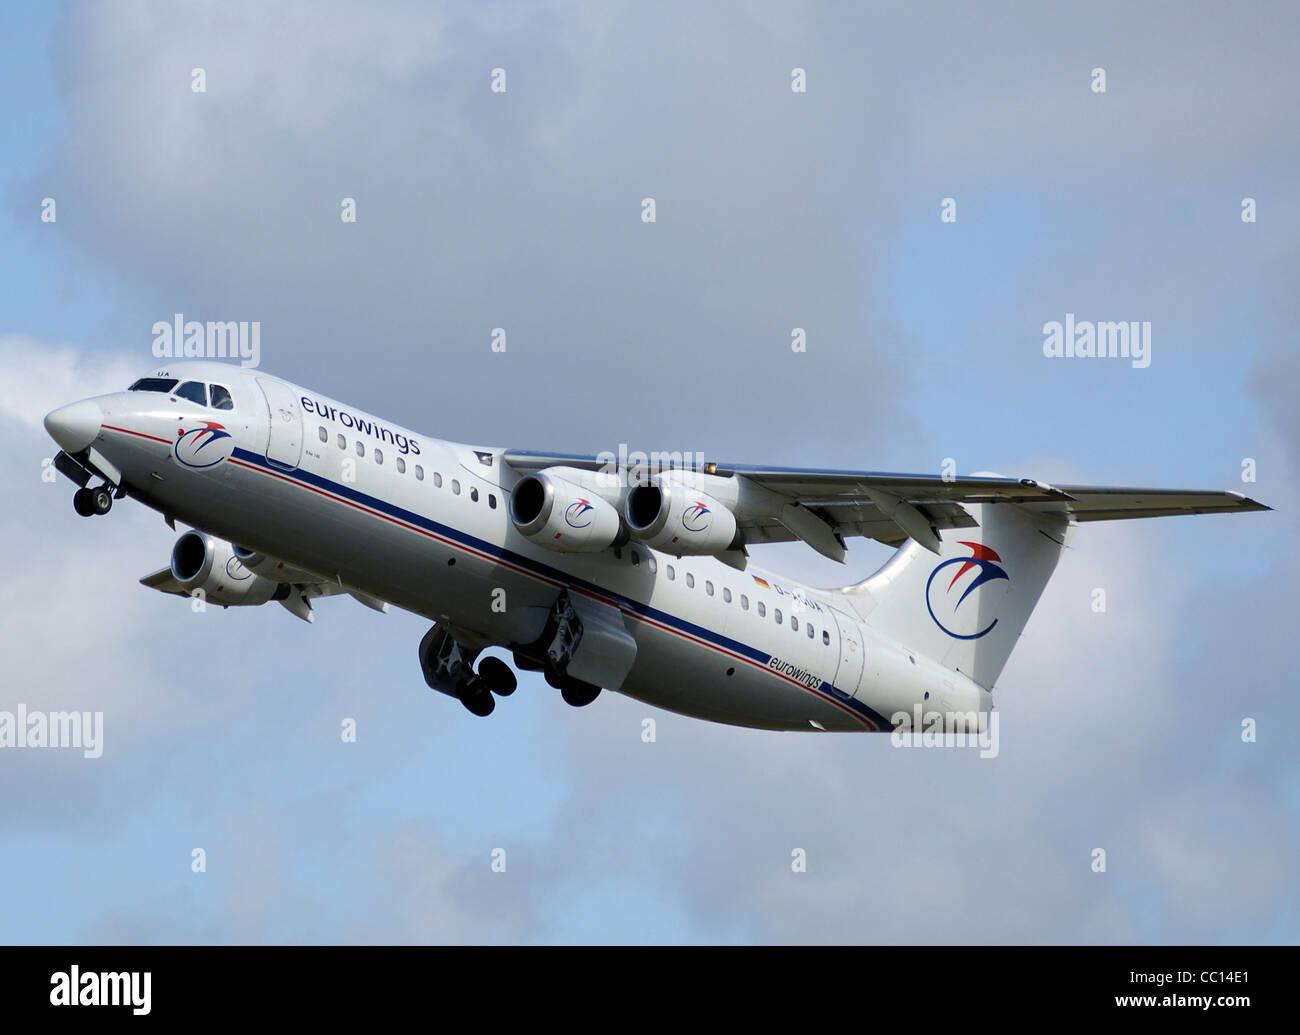 Eurowings British Aerospace 146-300 (D-AQUA) takes off from Bristol International Airport, Bristol, England. - Stock Image